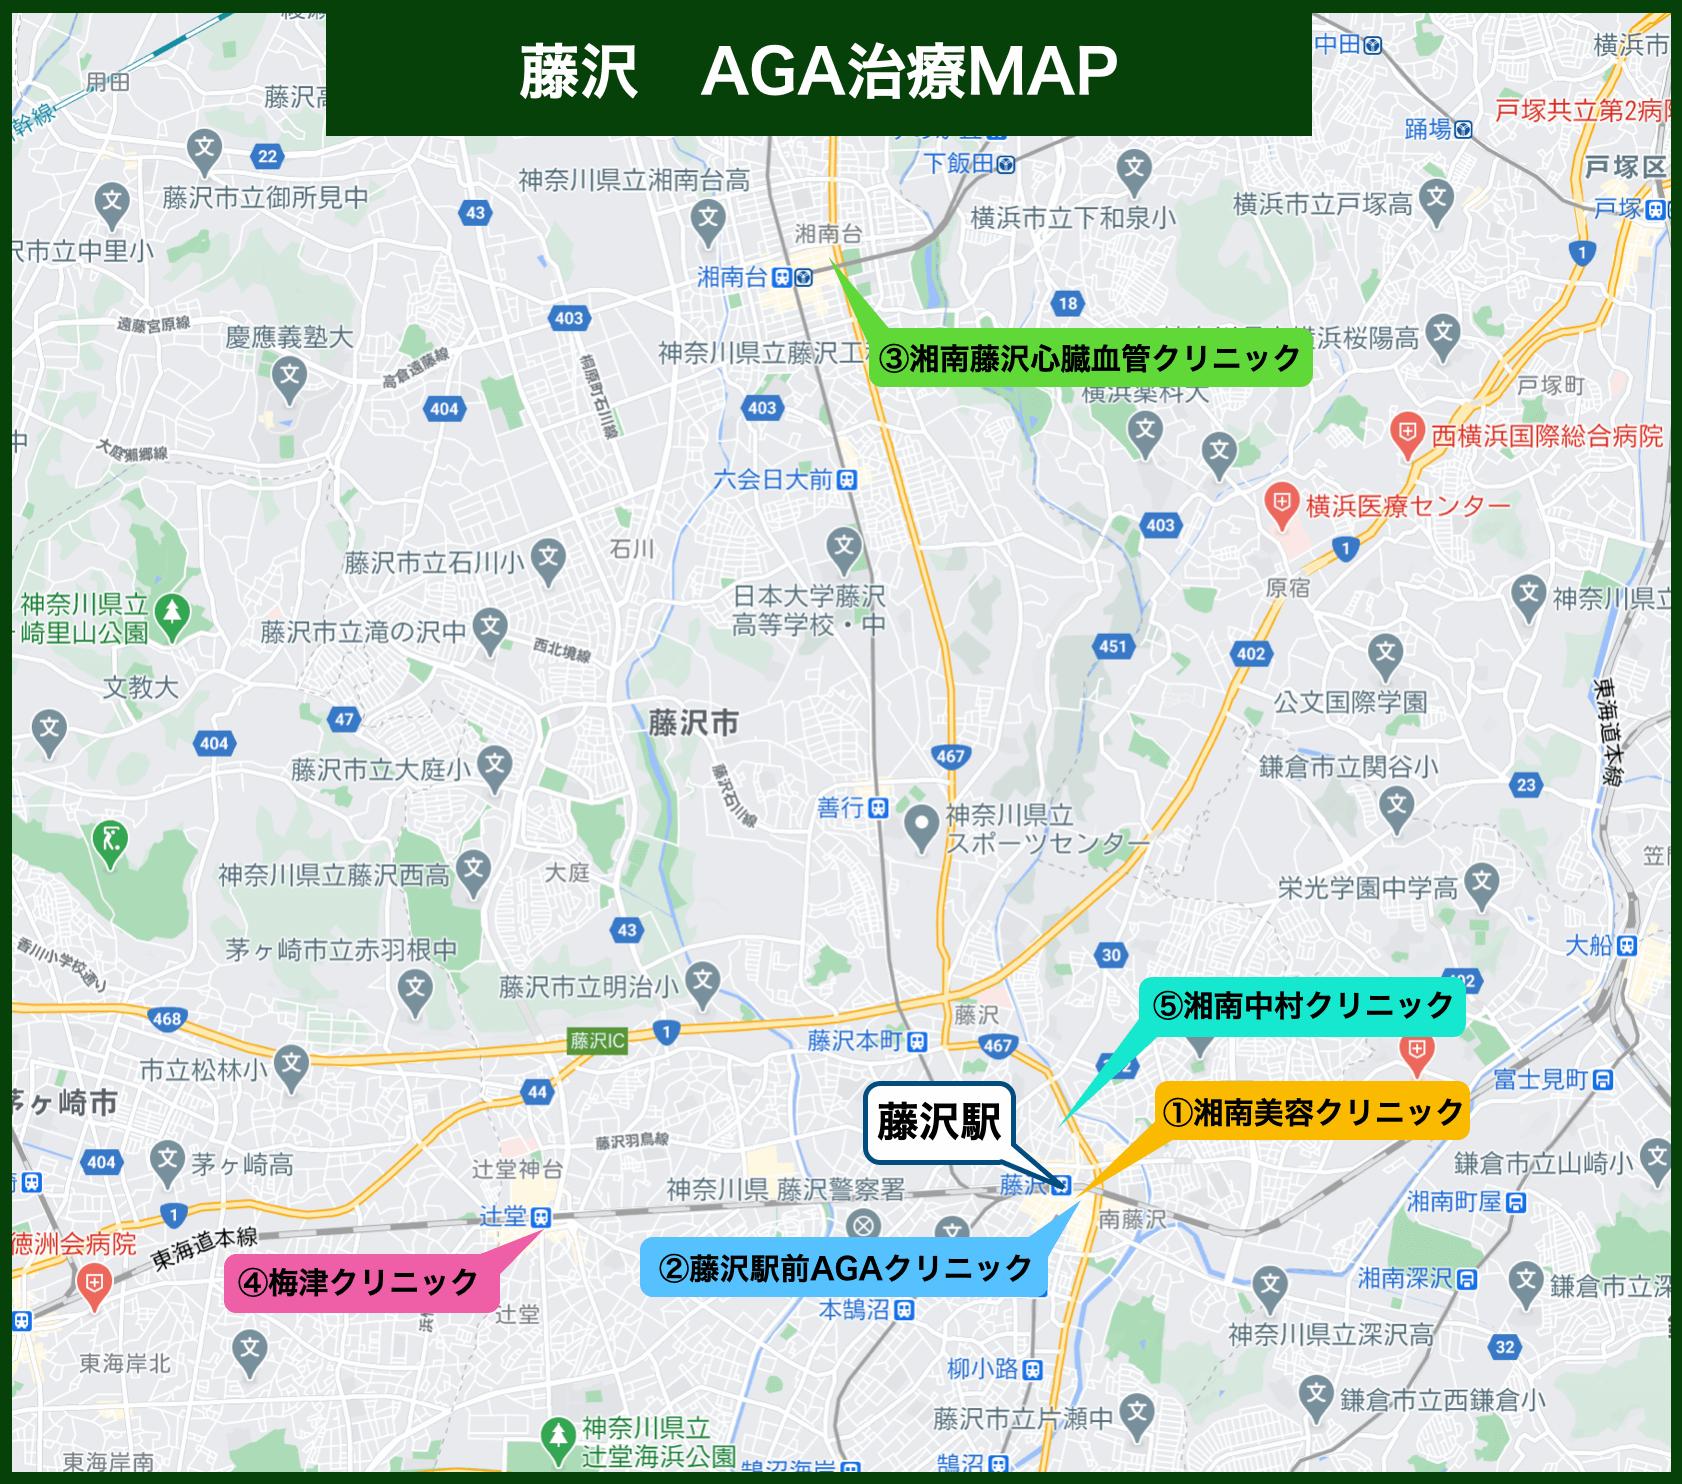 藤沢 AGA治療MAP